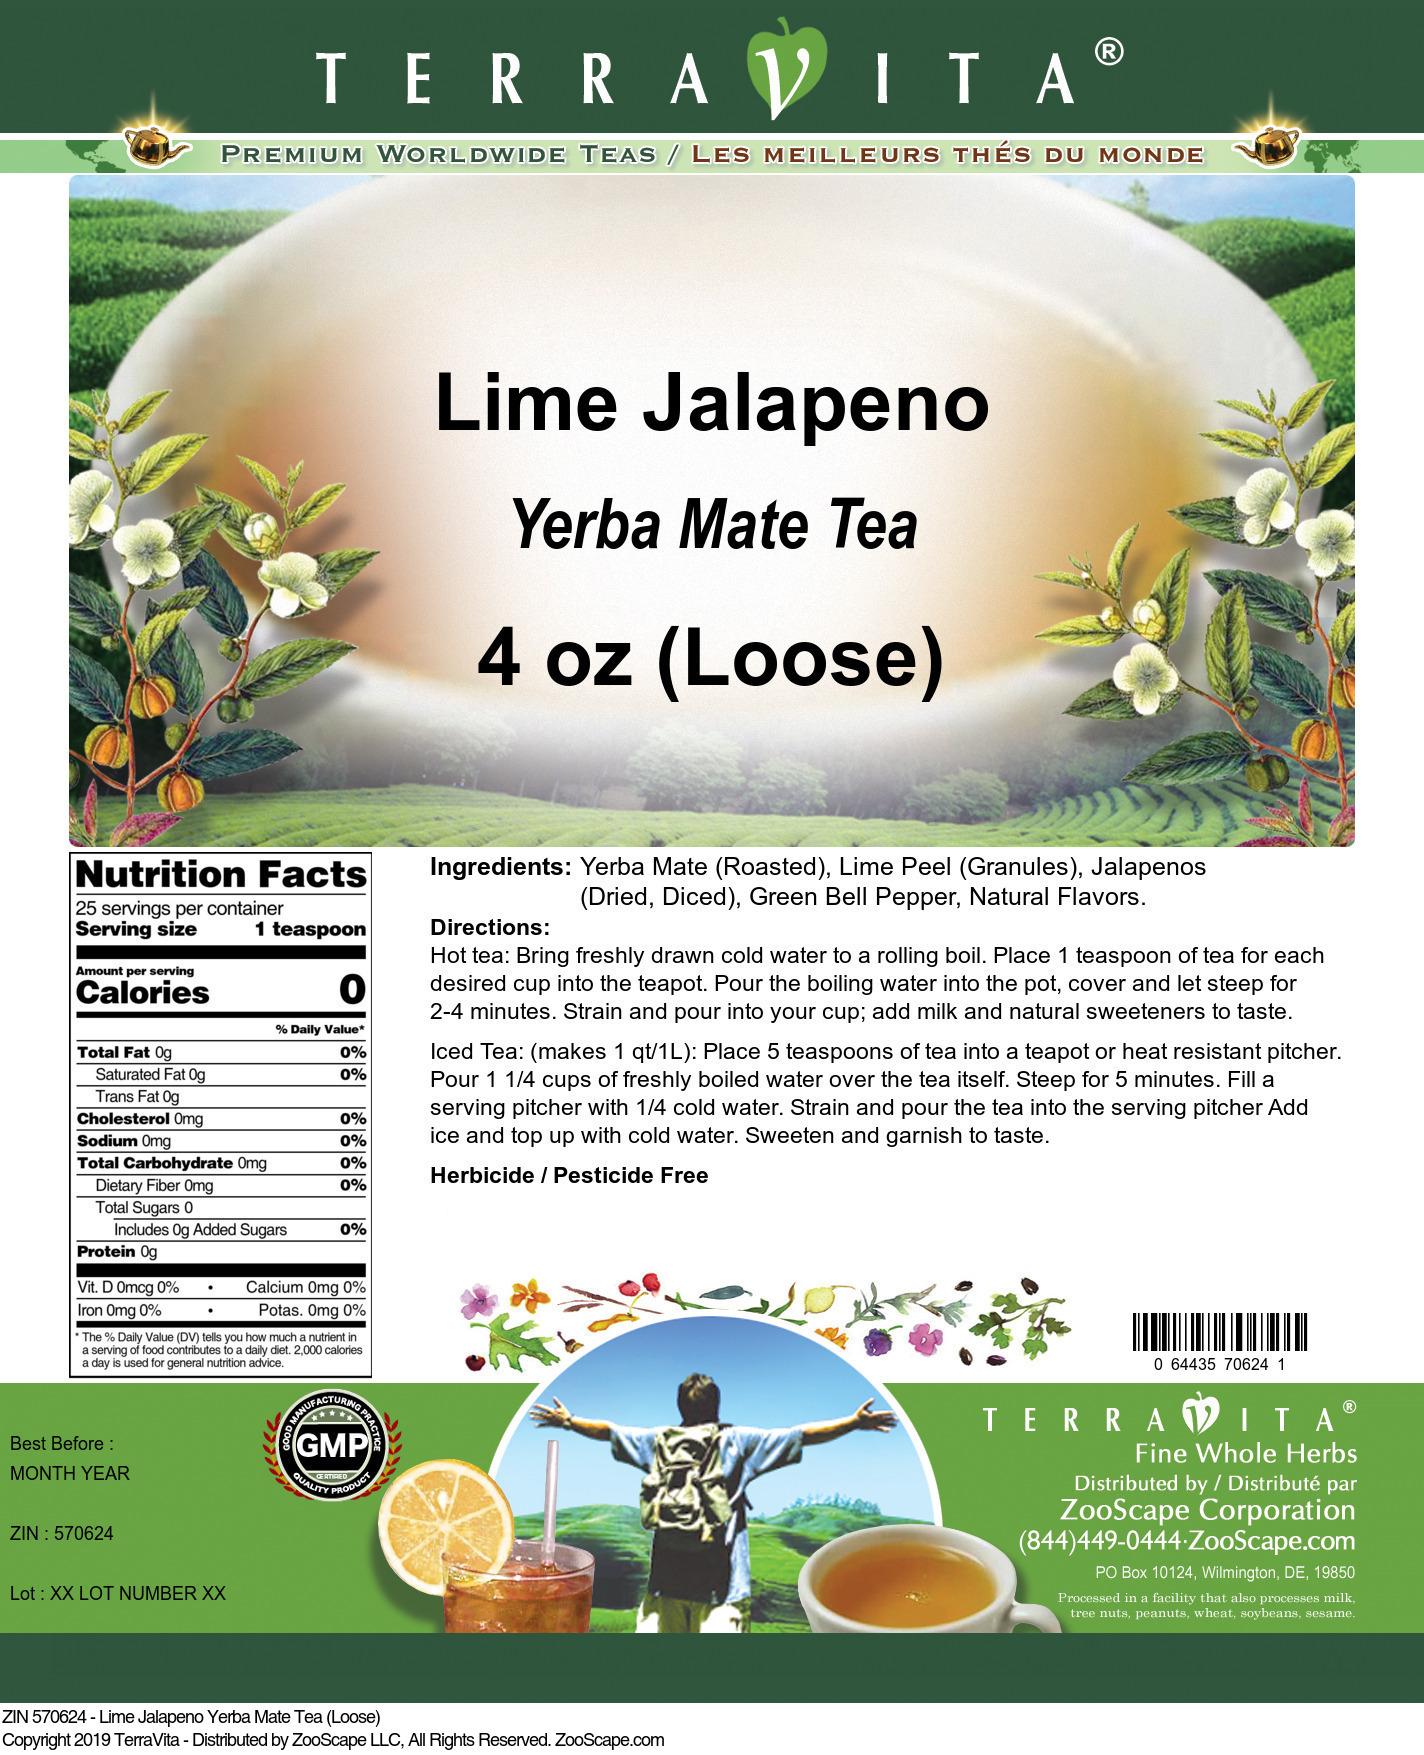 Lime Jalapeno Yerba Mate Tea (Loose)